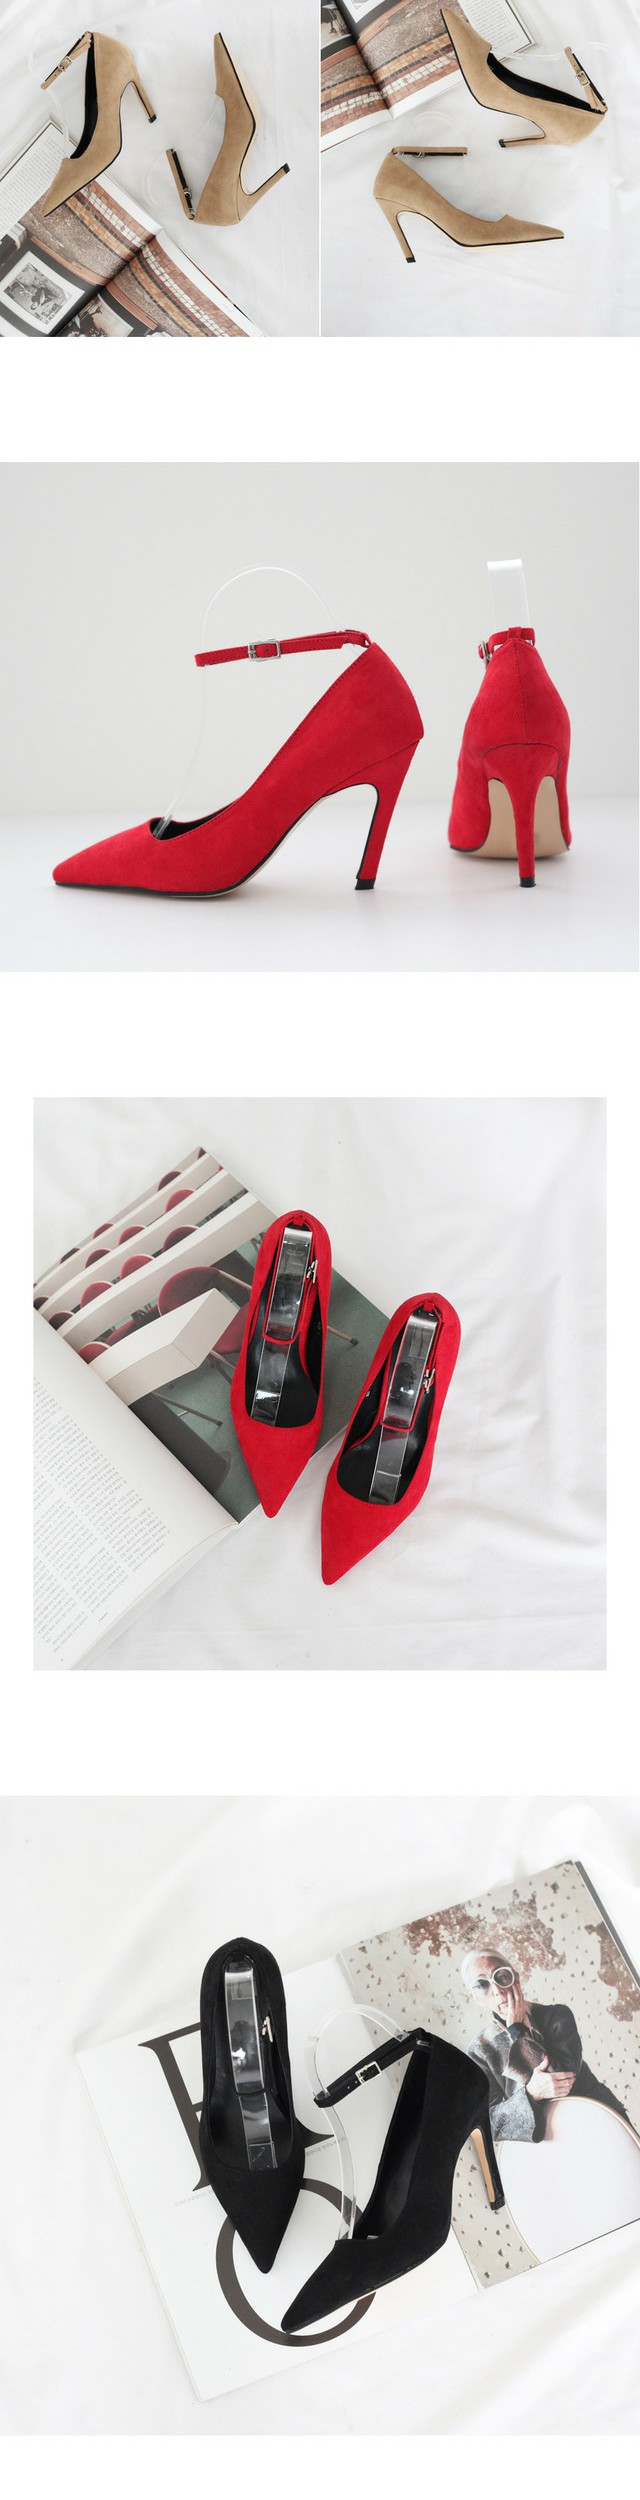 Milan Mary Jane Stiletto Heel 9cm